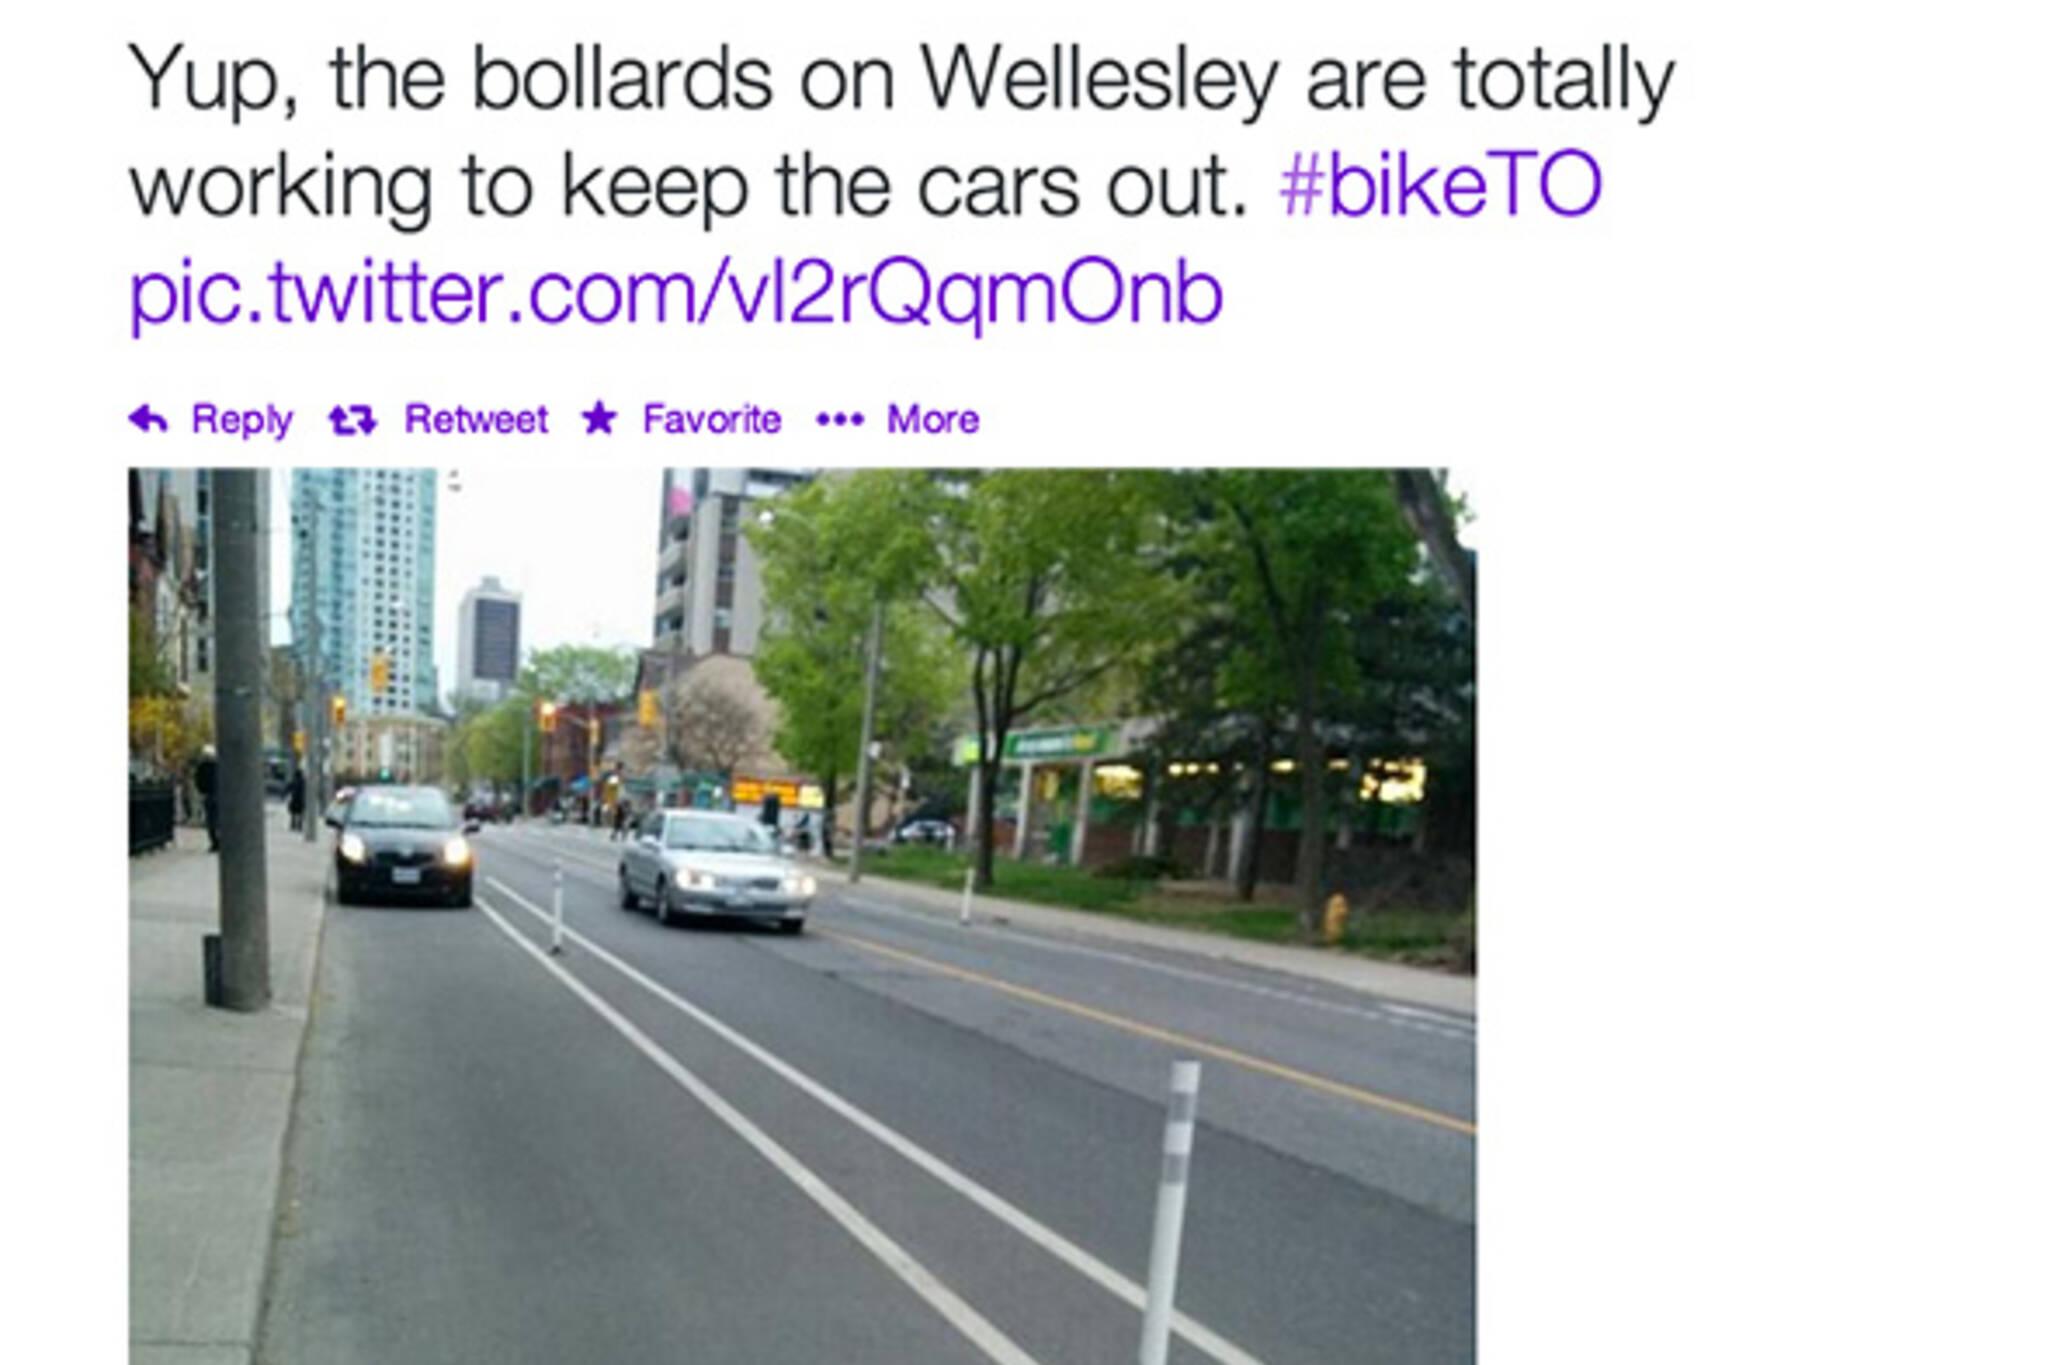 Wellesley Bike lanes